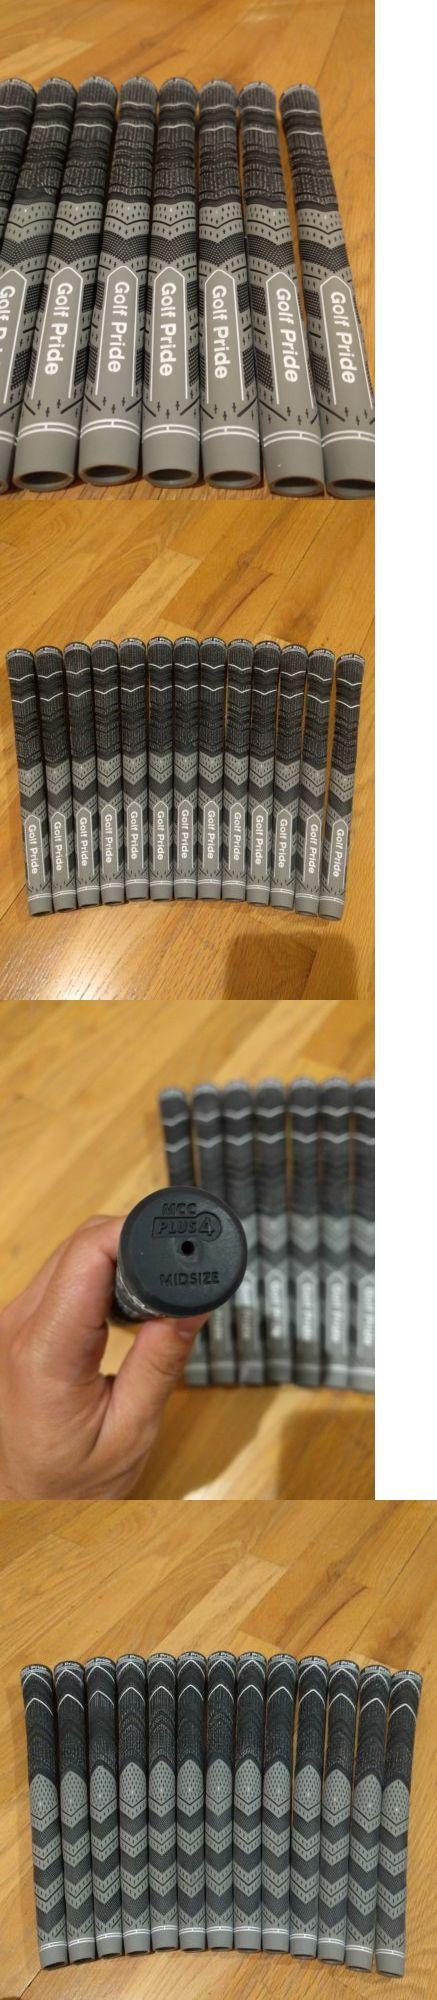 Golf Club Grips 47324: 13X Golf Pride Mcc Plus 4 Multicompound Golf Grips Gray Black Midsize Set -> BUY IT NOW ONLY: $100 on eBay!